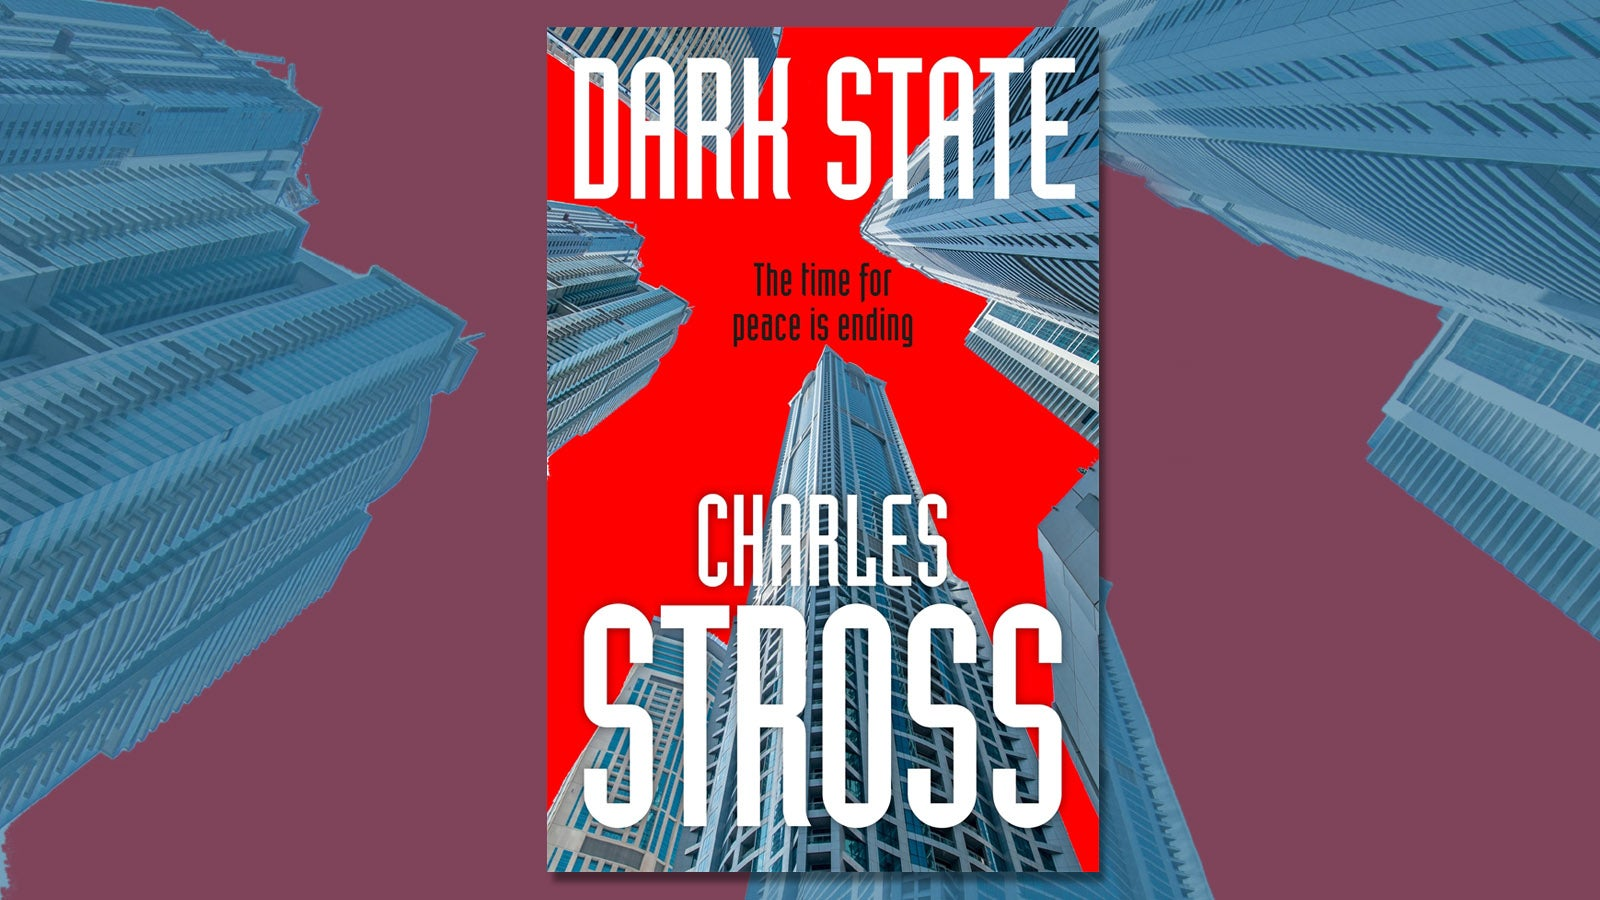 charles-stross-dark-state-book-empire-games (1).jpg